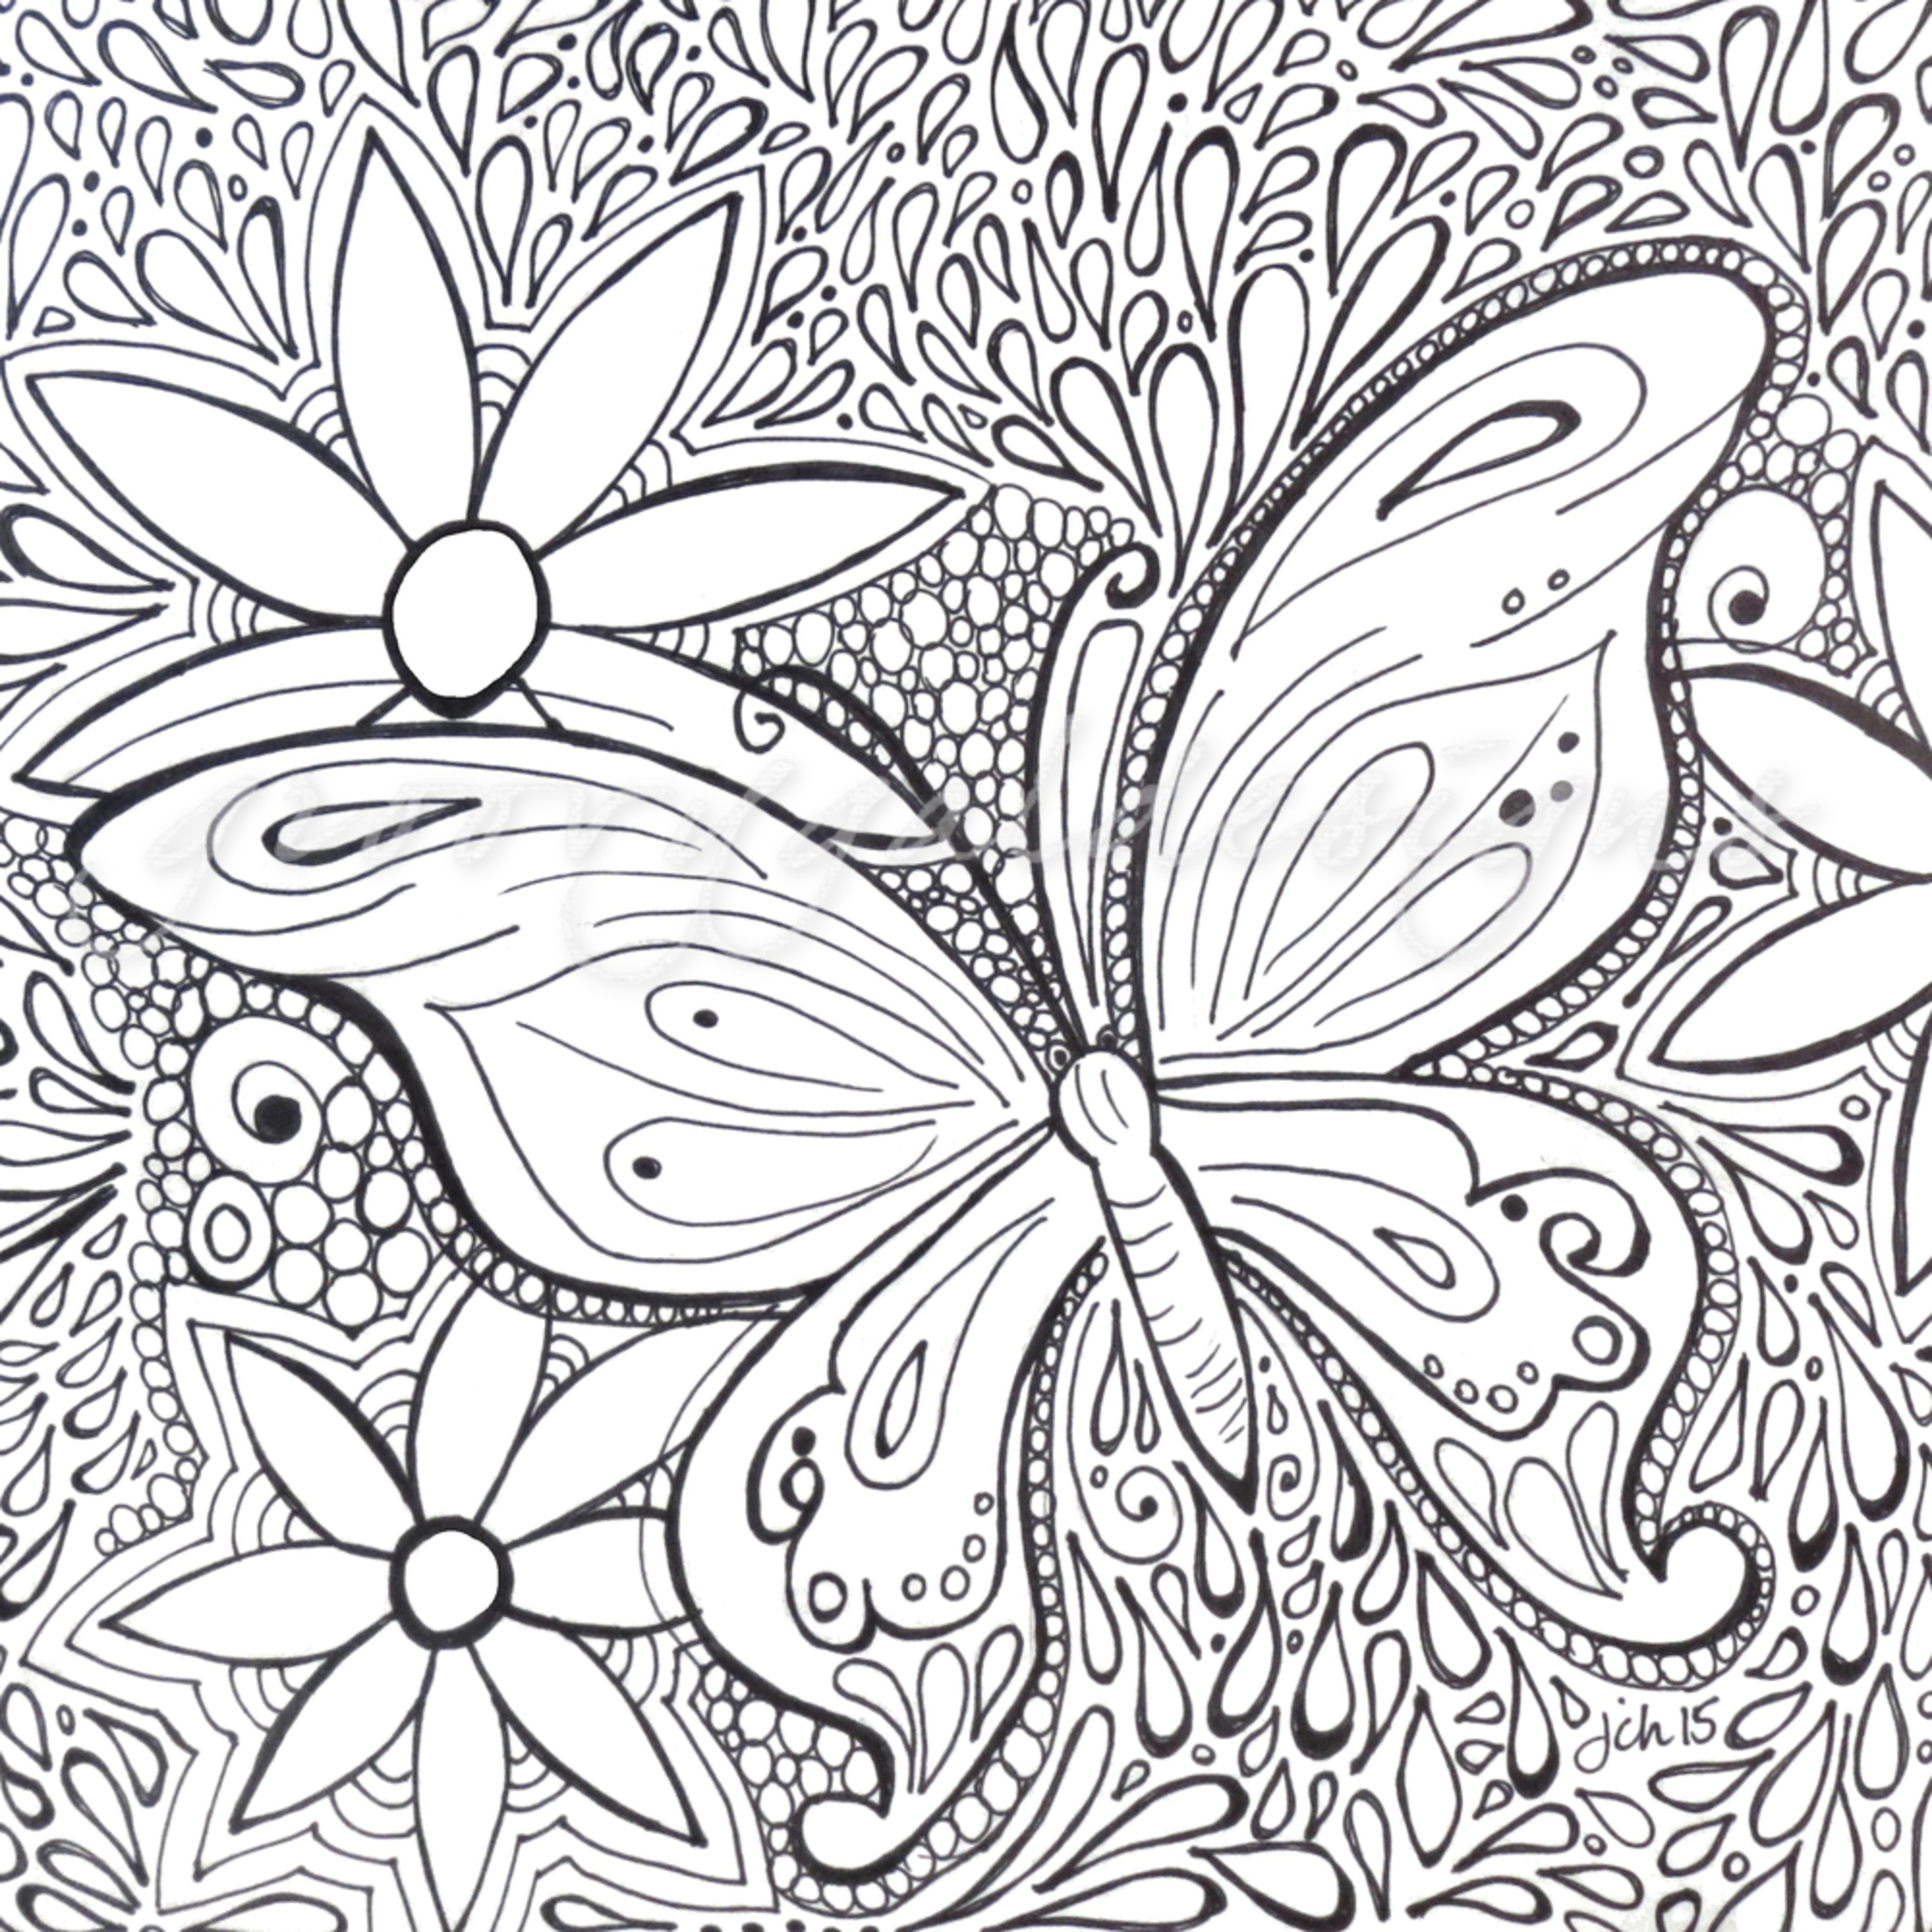 Butterfly color it ik761q